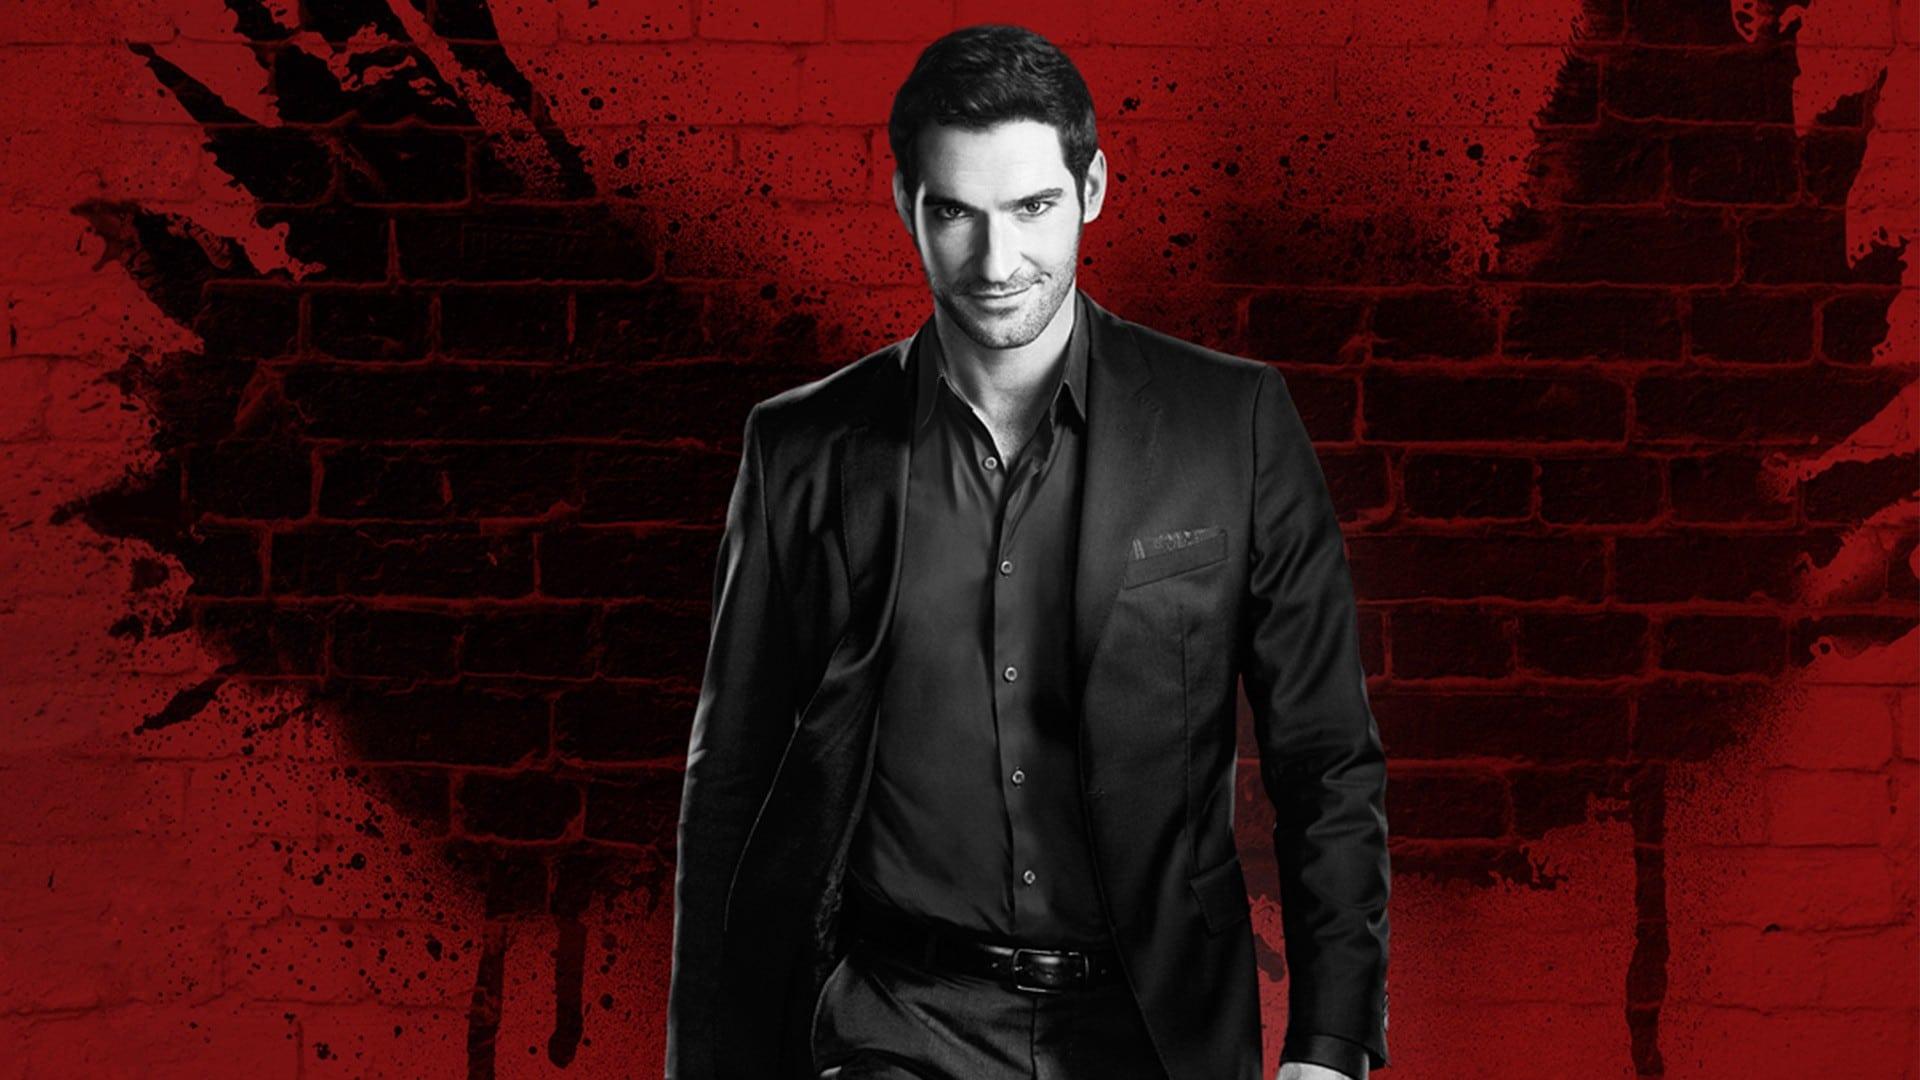 Lucifer the Devil